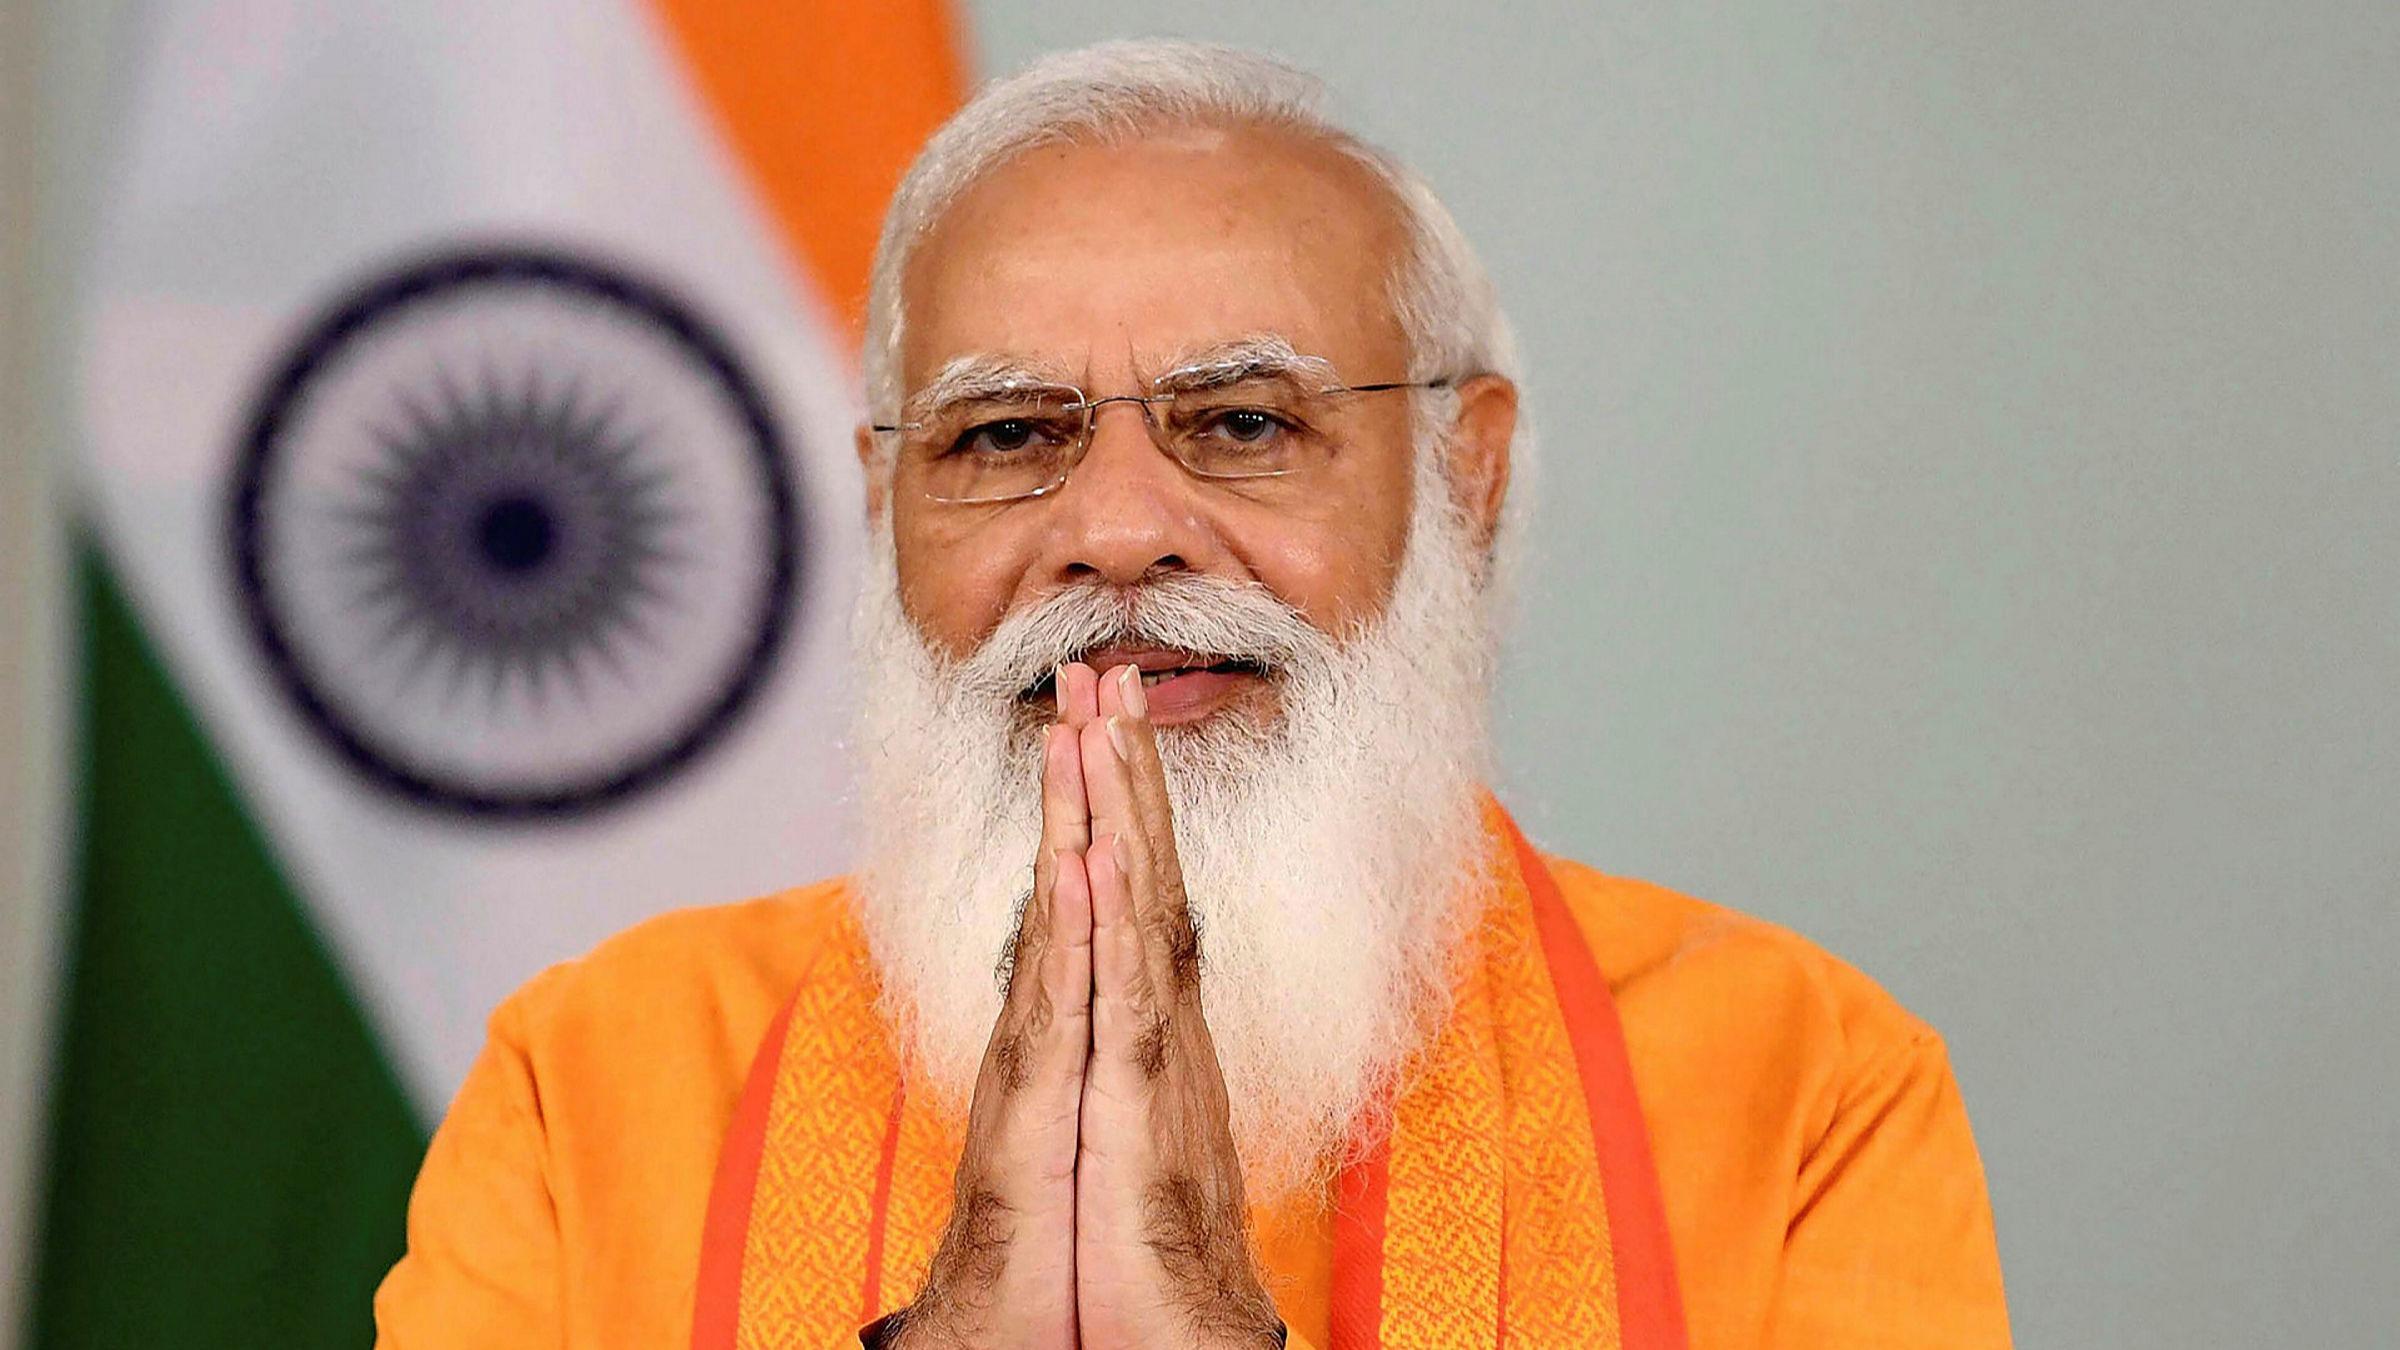 Narendra Modi the style king puts on the guru look | Financial Times